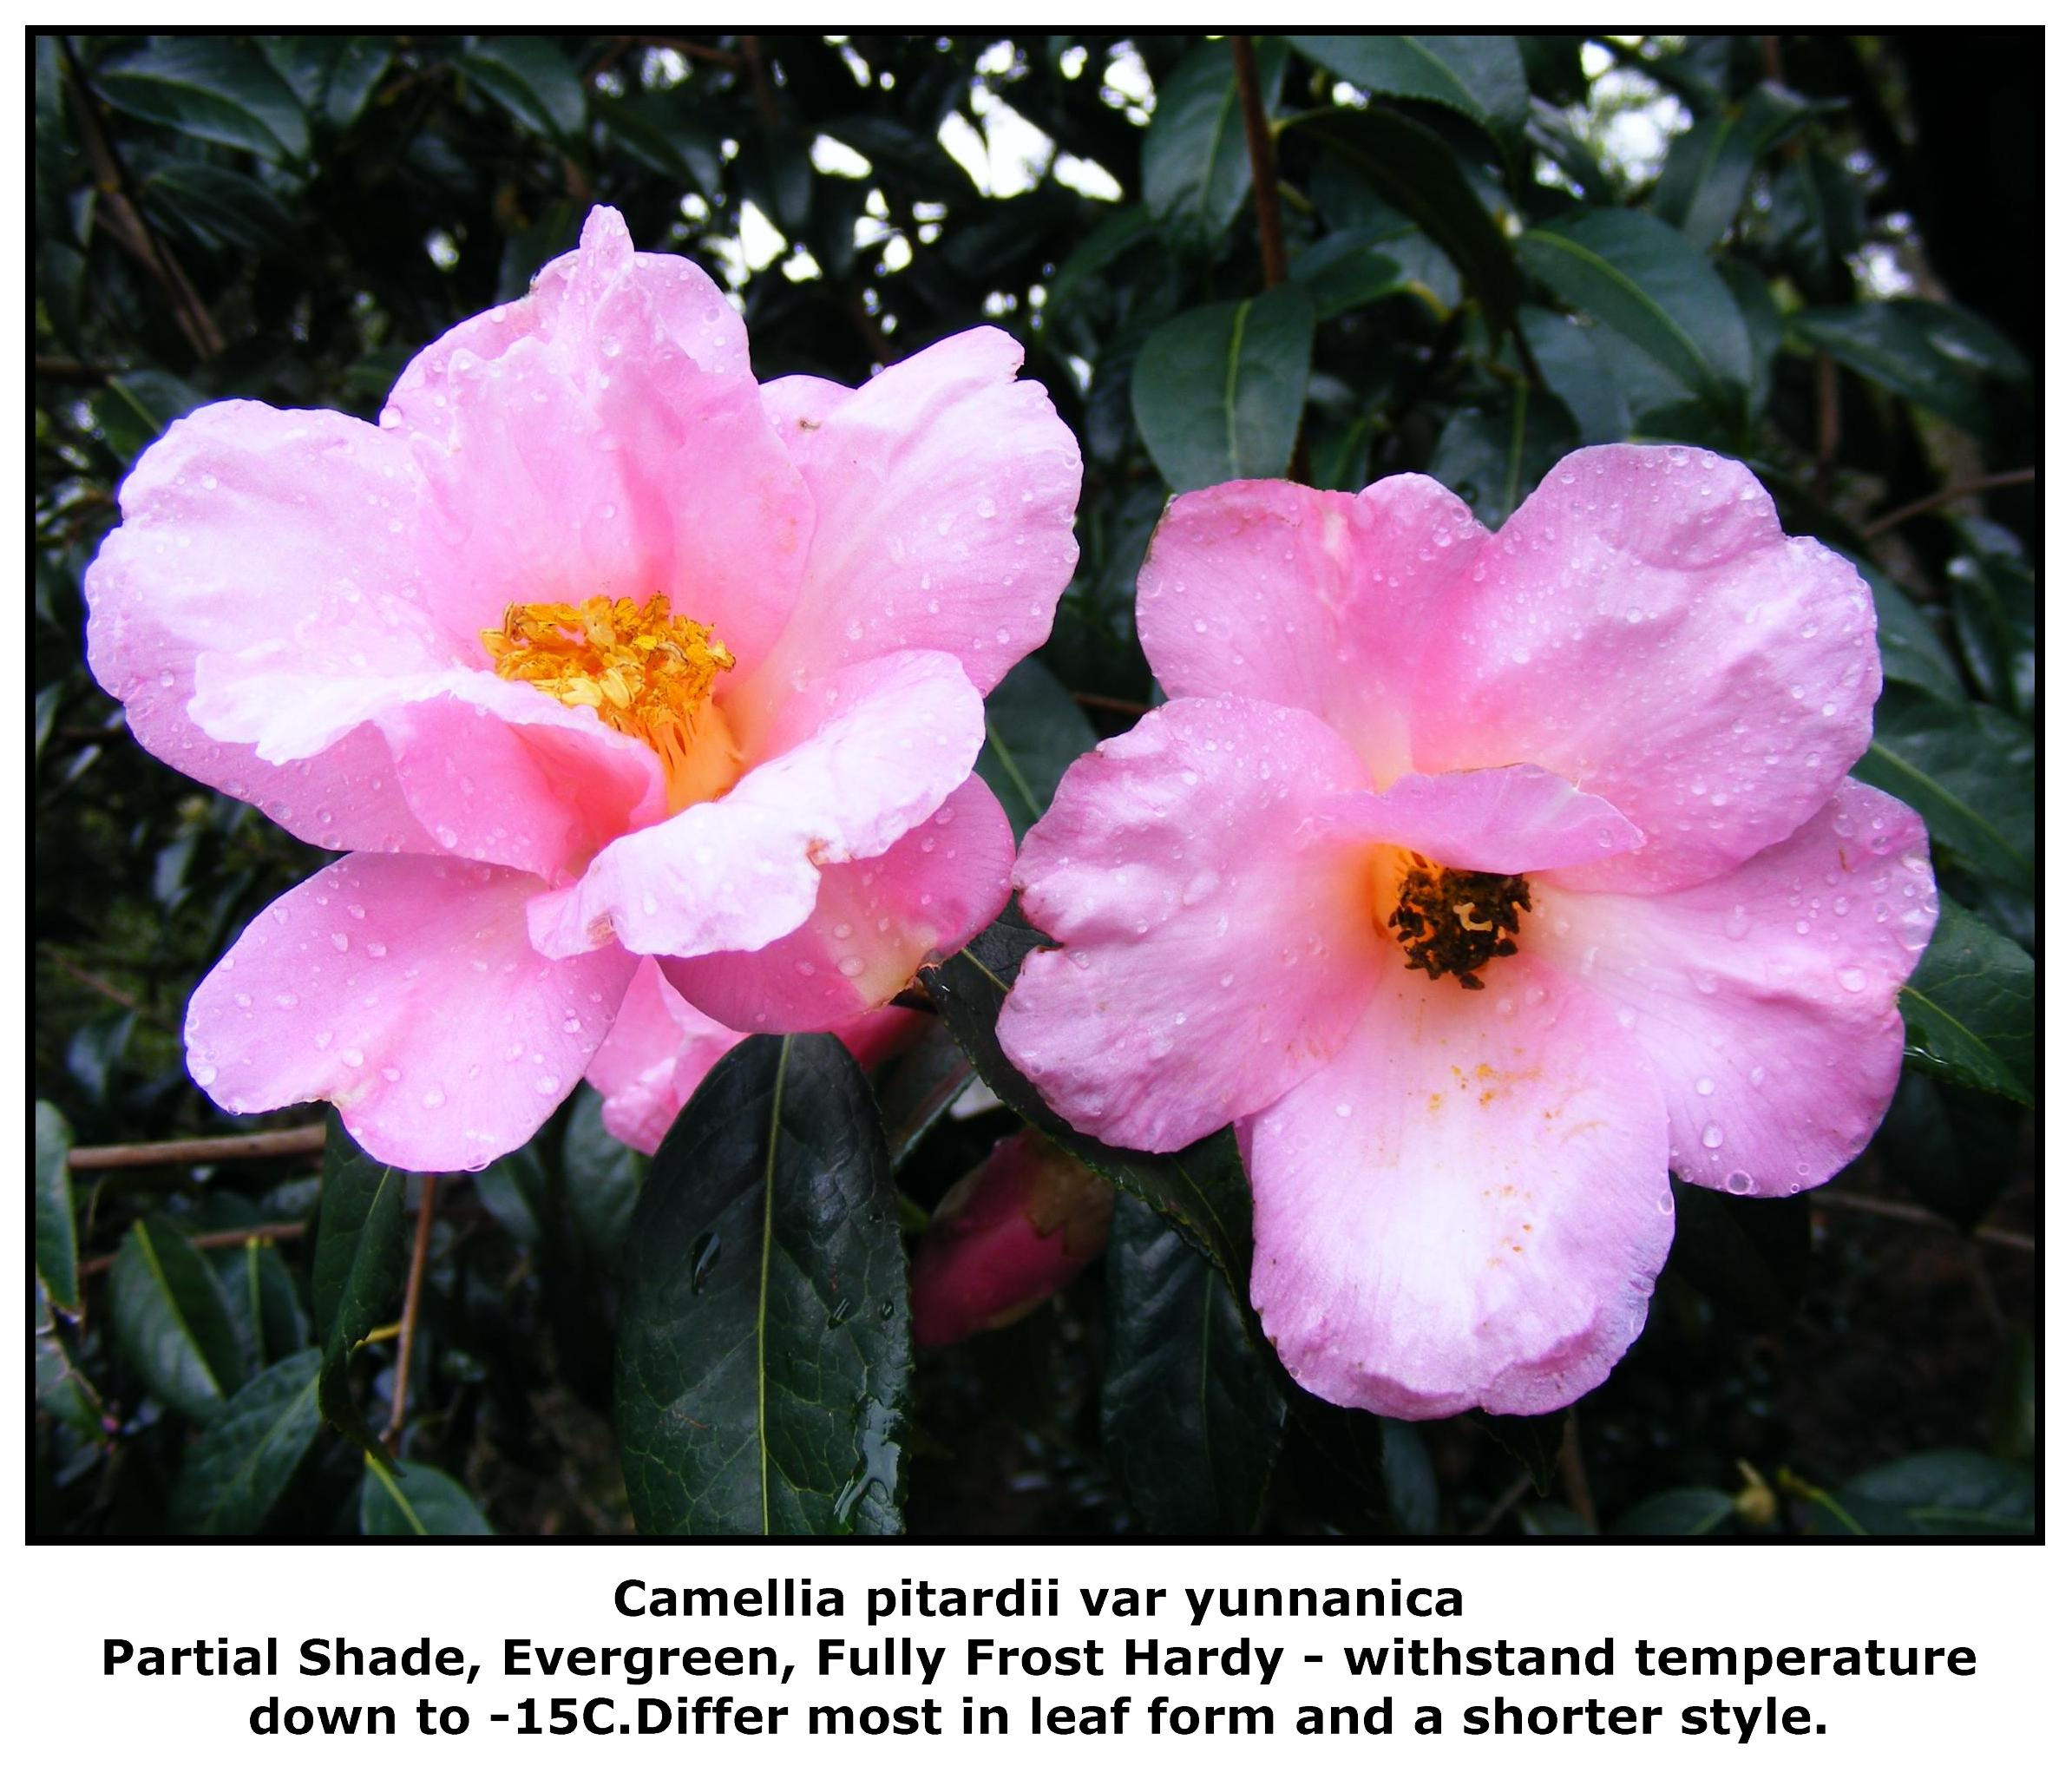 C. pitardii var yunnanica